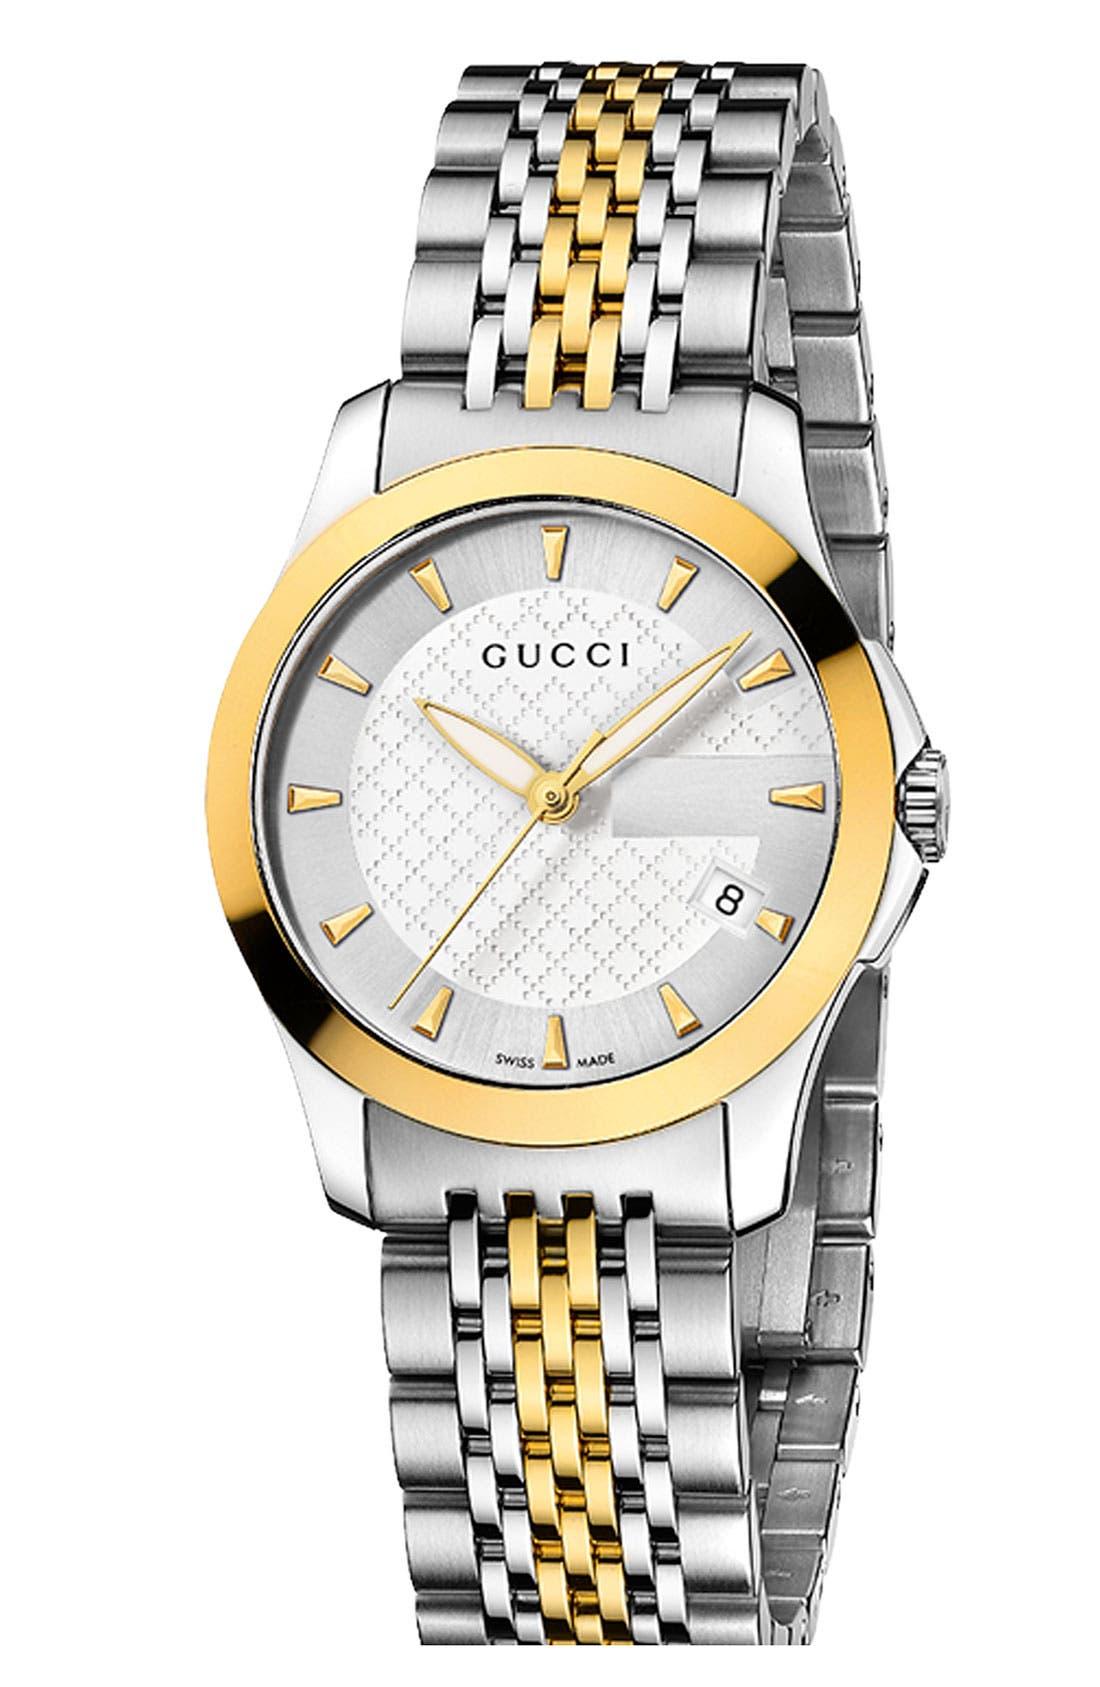 Main Image - Gucci 'G Timeless' Small Bracelet Watch, 27mm